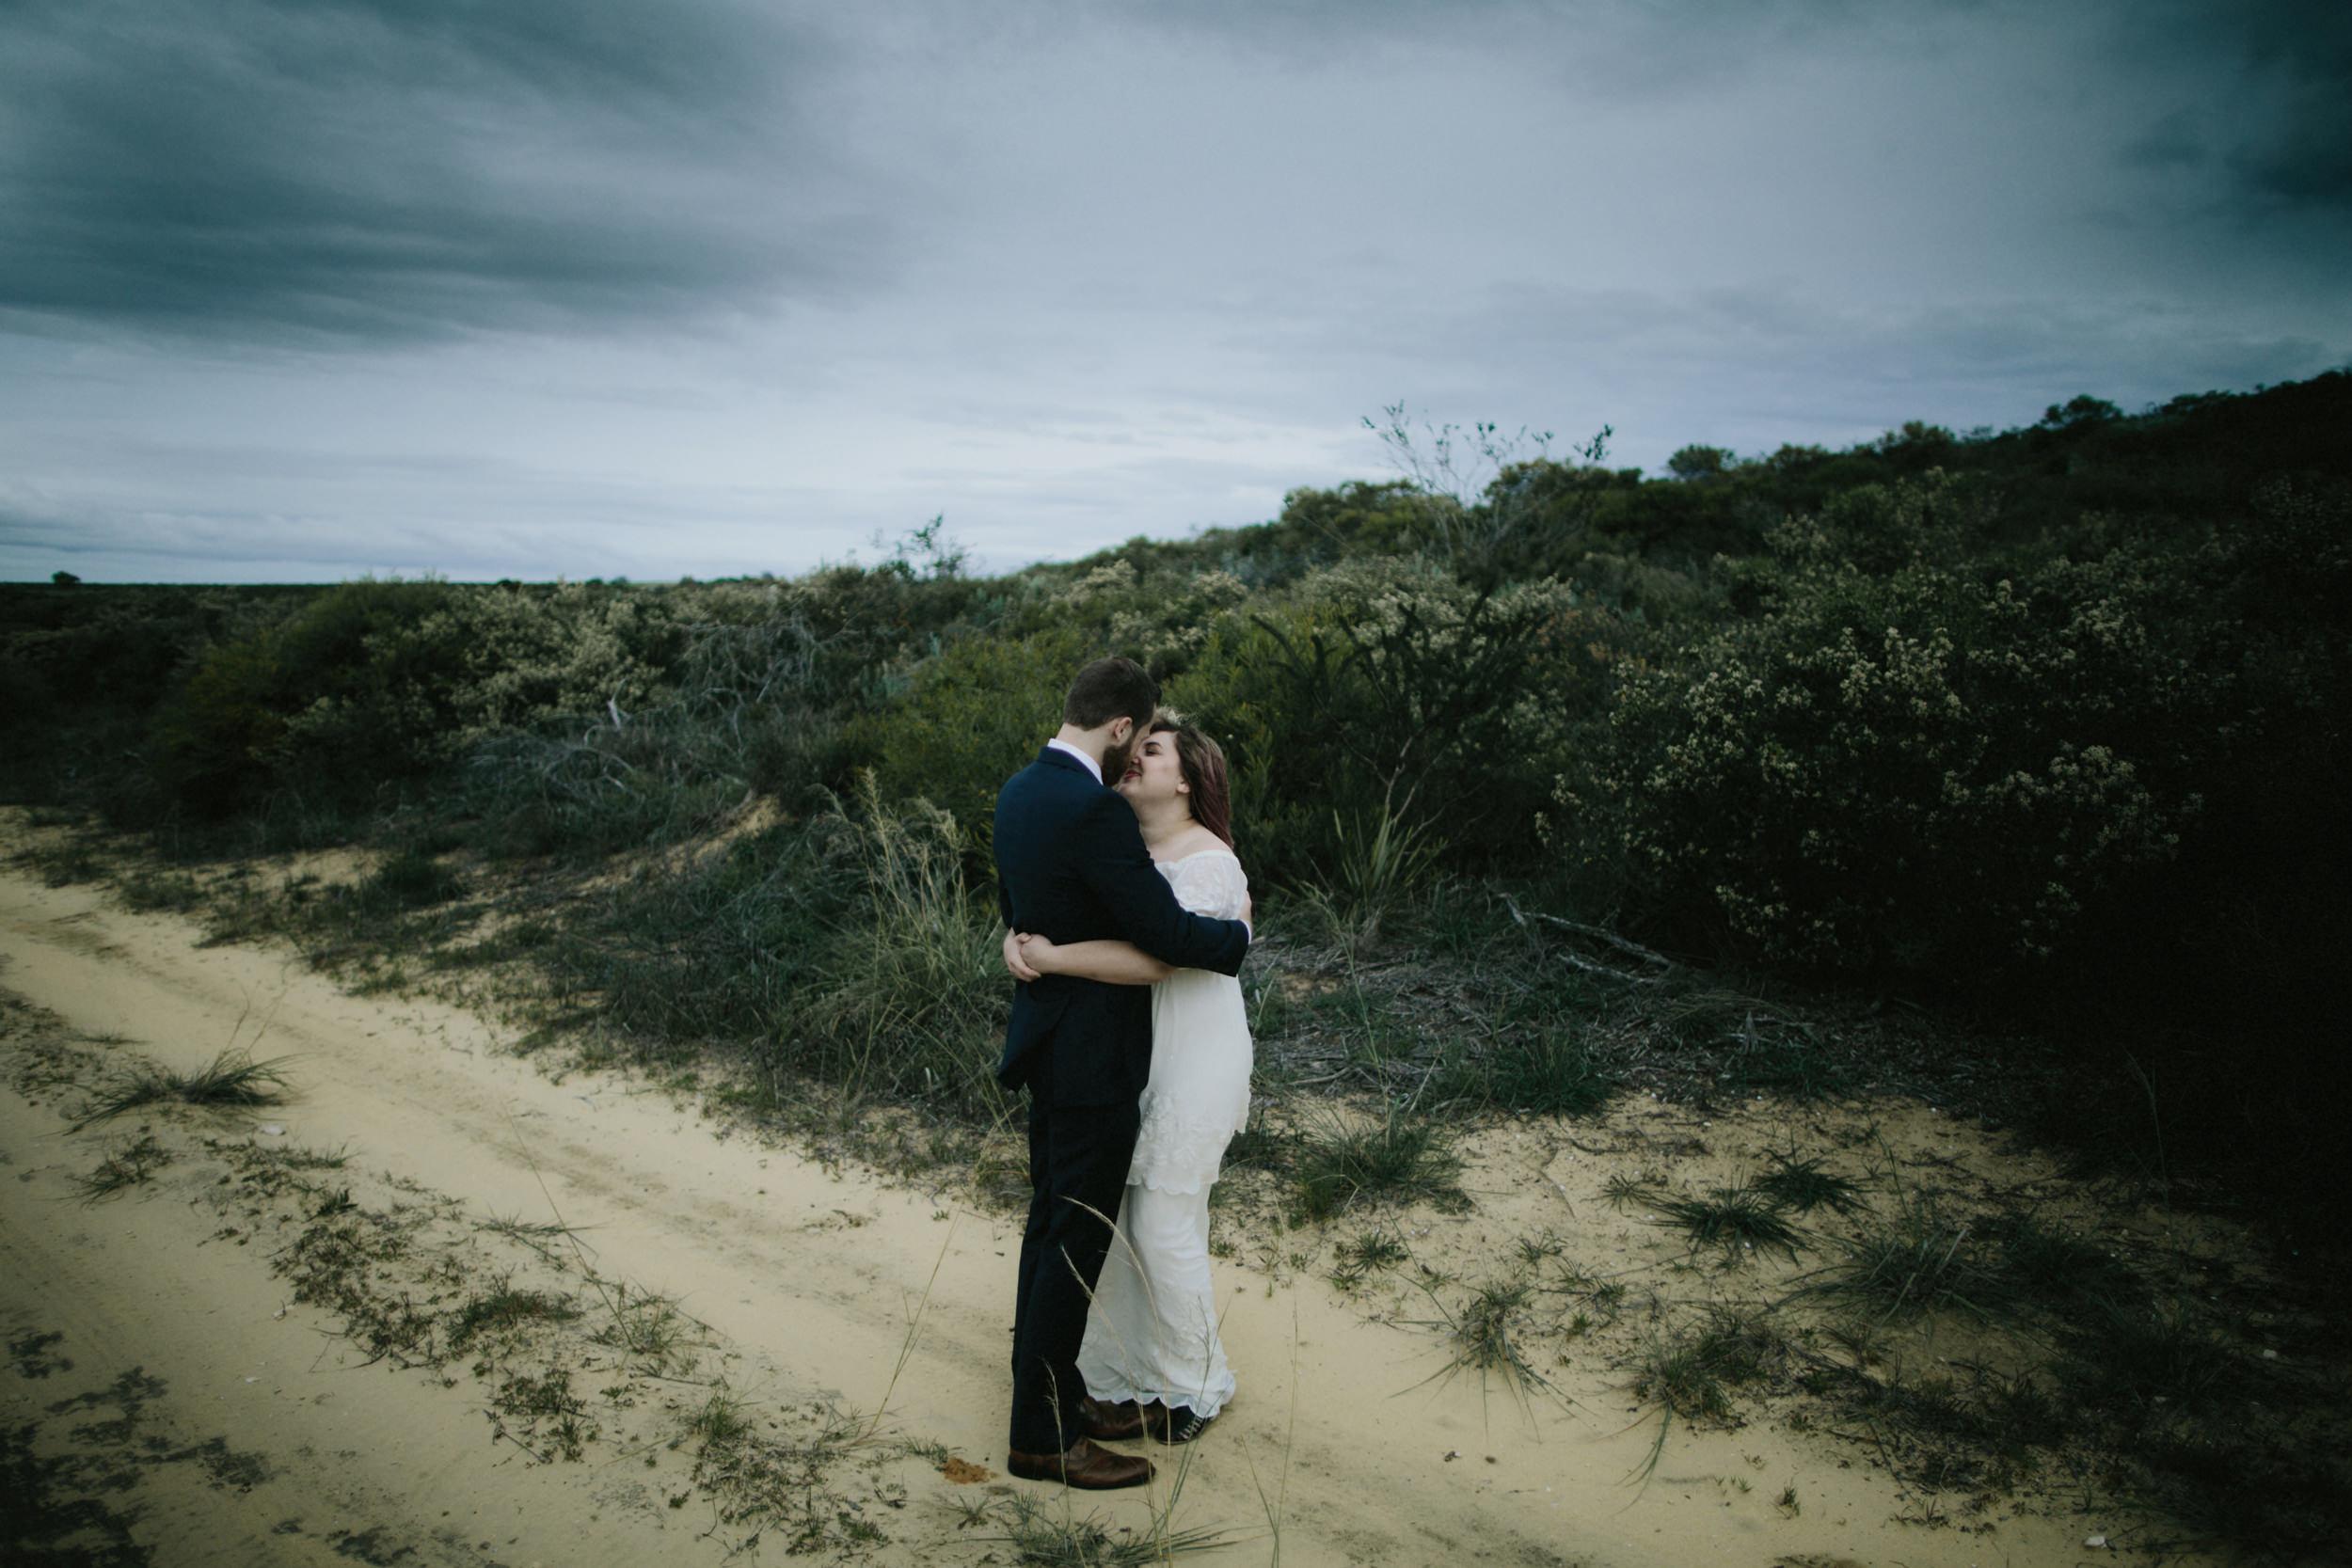 I-Got-You-Babe-Weddings-Hannah-Brent-Anniversary0014.JPG